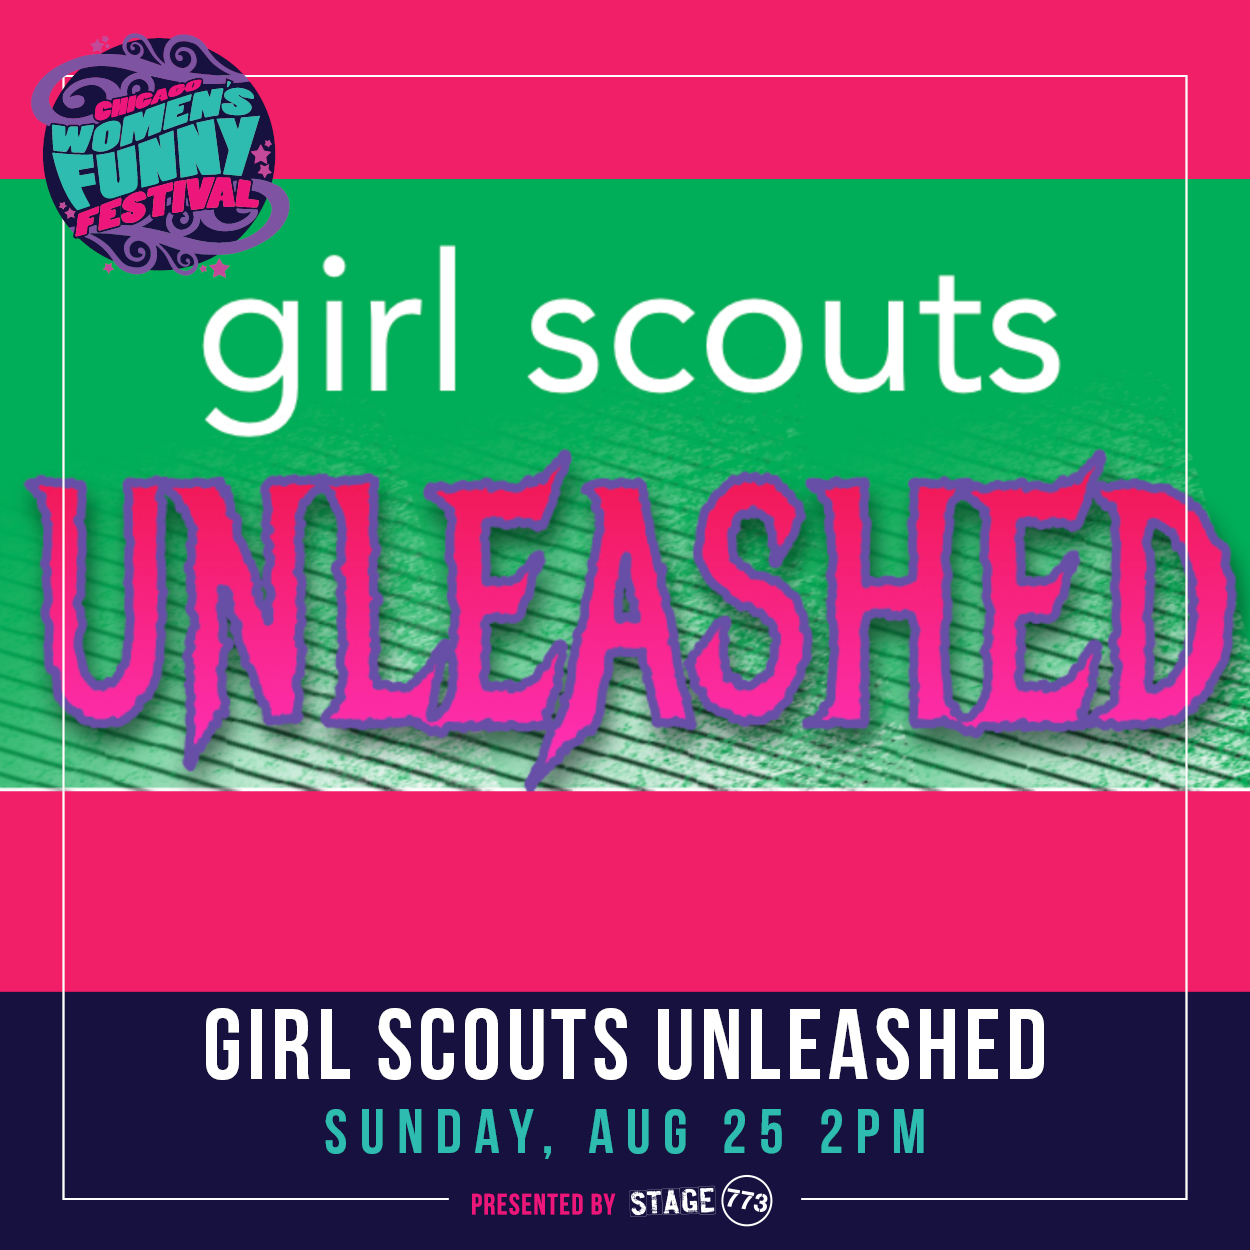 GirlScoutsUnleashed_Sunday_2PM_CWFF20194.jpg